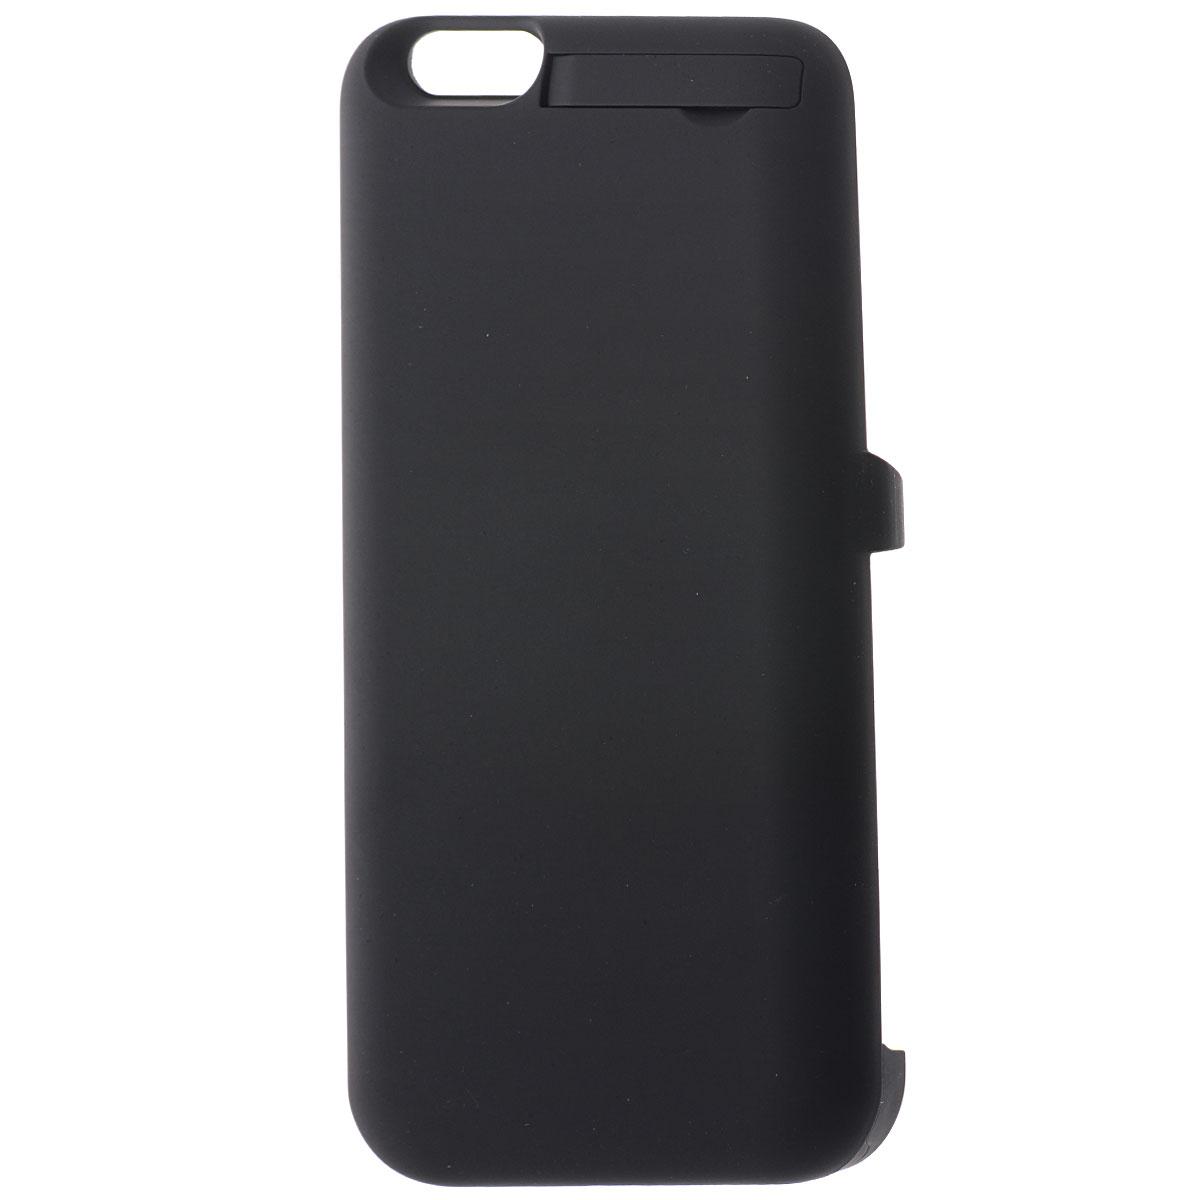 EXEQ HelpinG-iC08 чехол-аккумулятор для iPhone 6, Black (3300 мАч, клип-кейс)